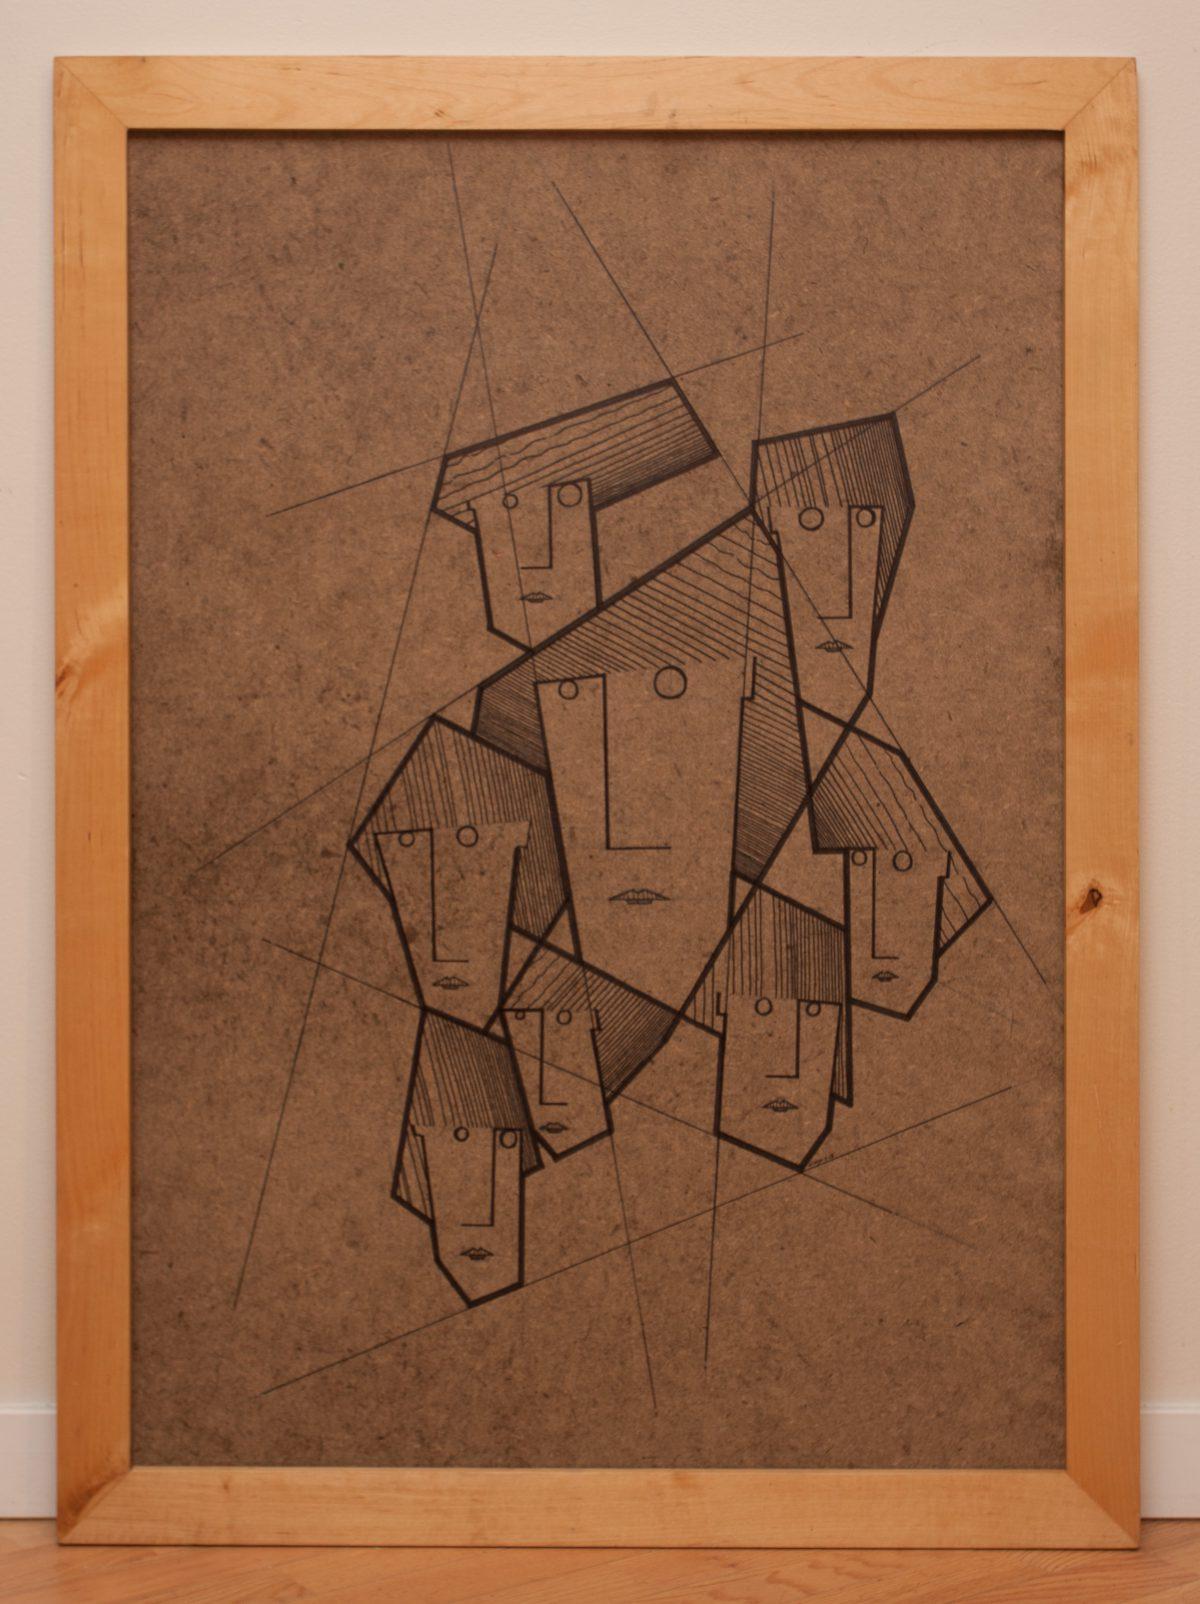 Eight Sisters 3/3 - 70x100cm, pen on fibreboard, ch3, pen, wood, illustration, frame